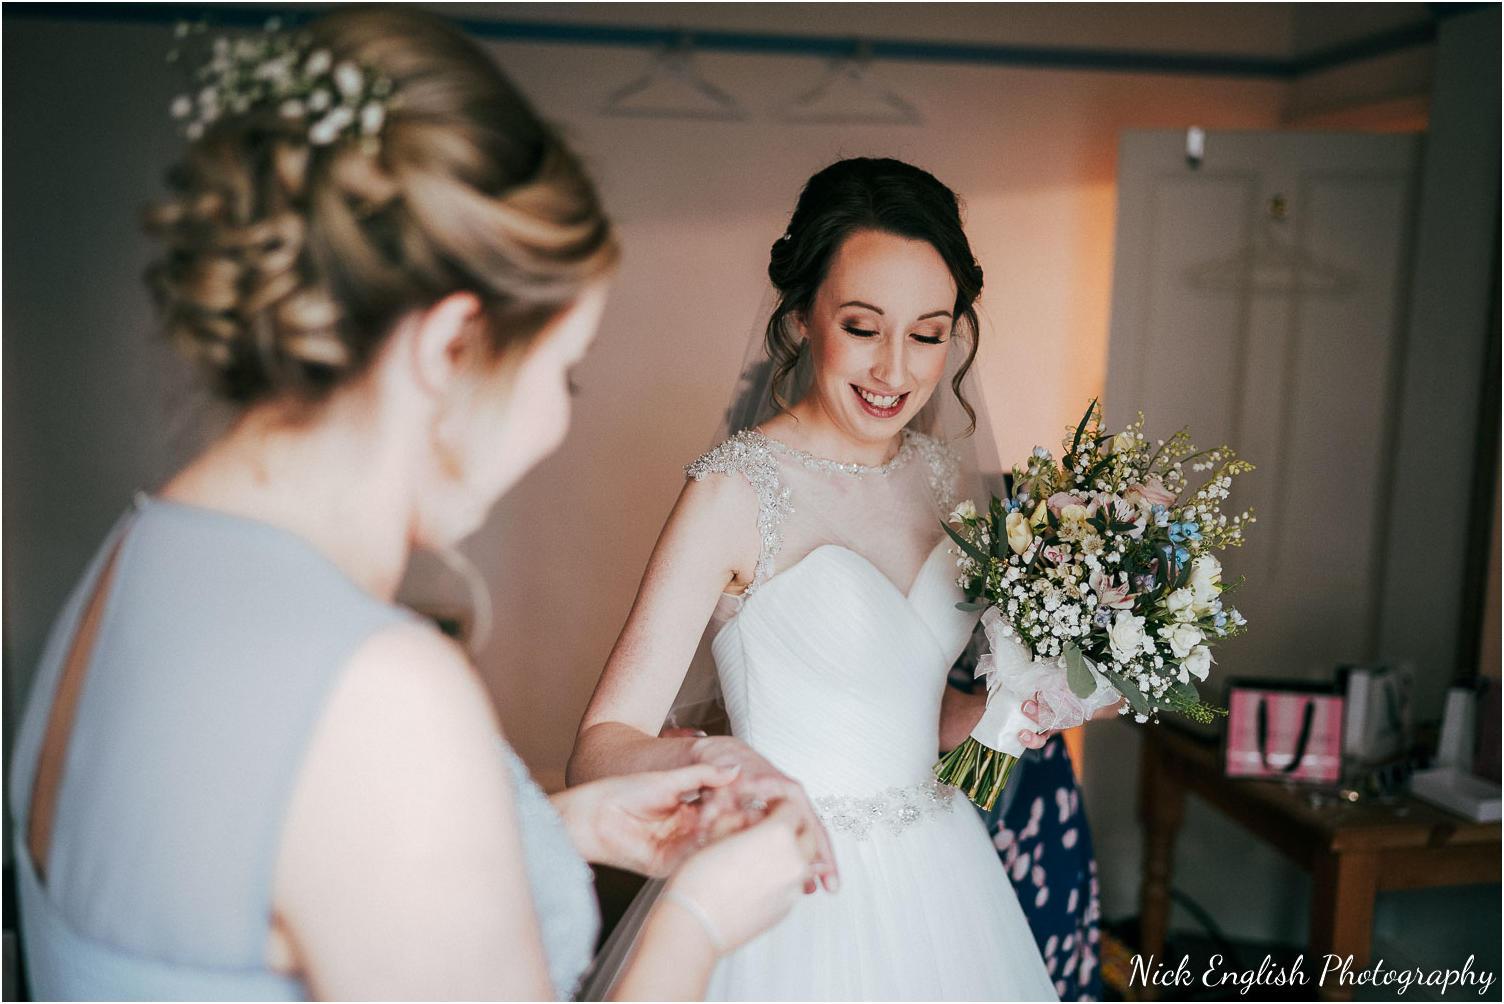 Mitton_Hall_Wedding_Photographer-13.jpg